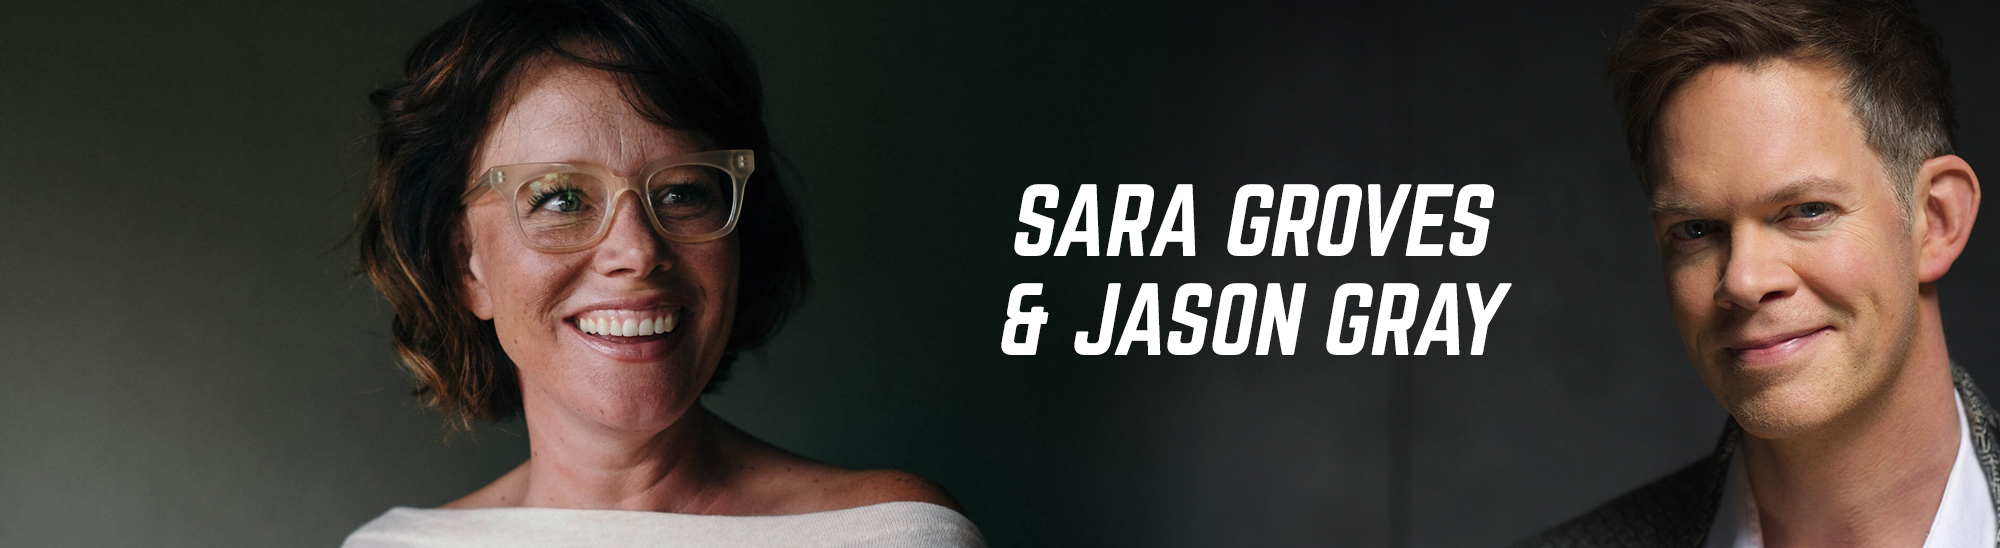 sara-groves-jason-gray